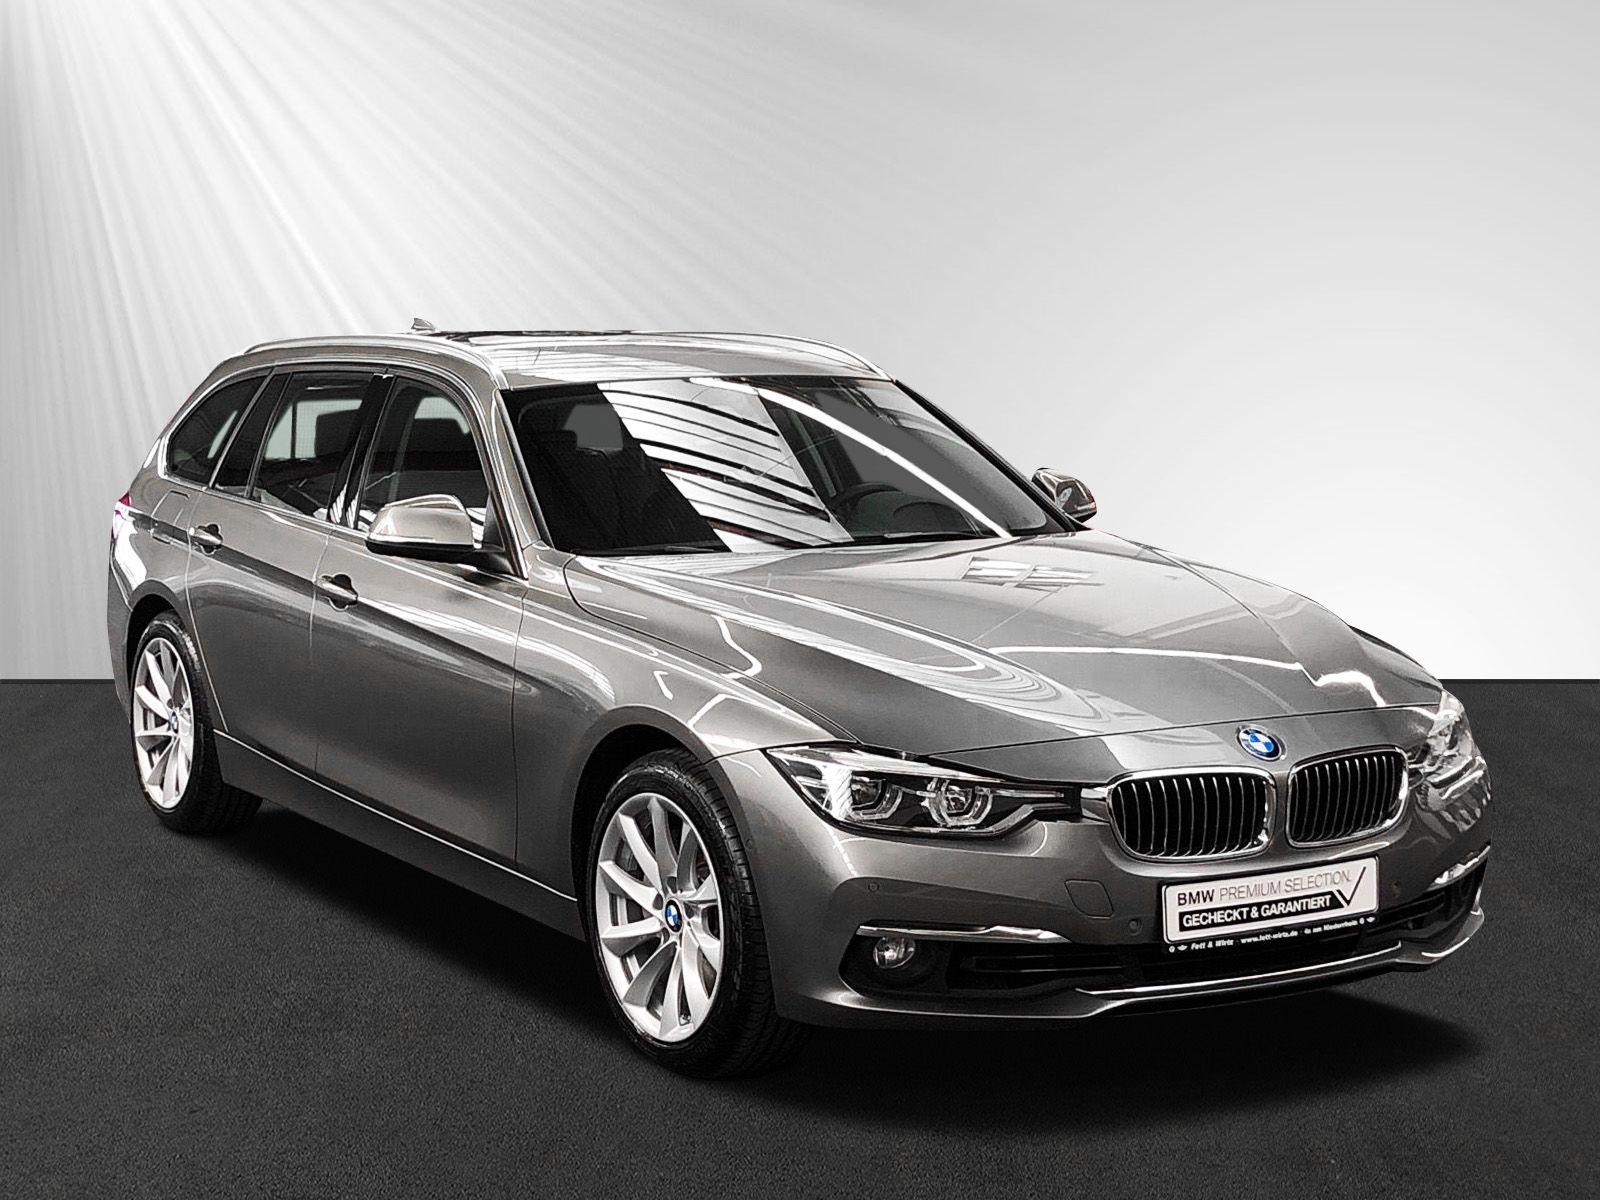 BMW 340i xDrive Touring Luxury Line Aut. AHK LED PDC, Jahr 2015, petrol